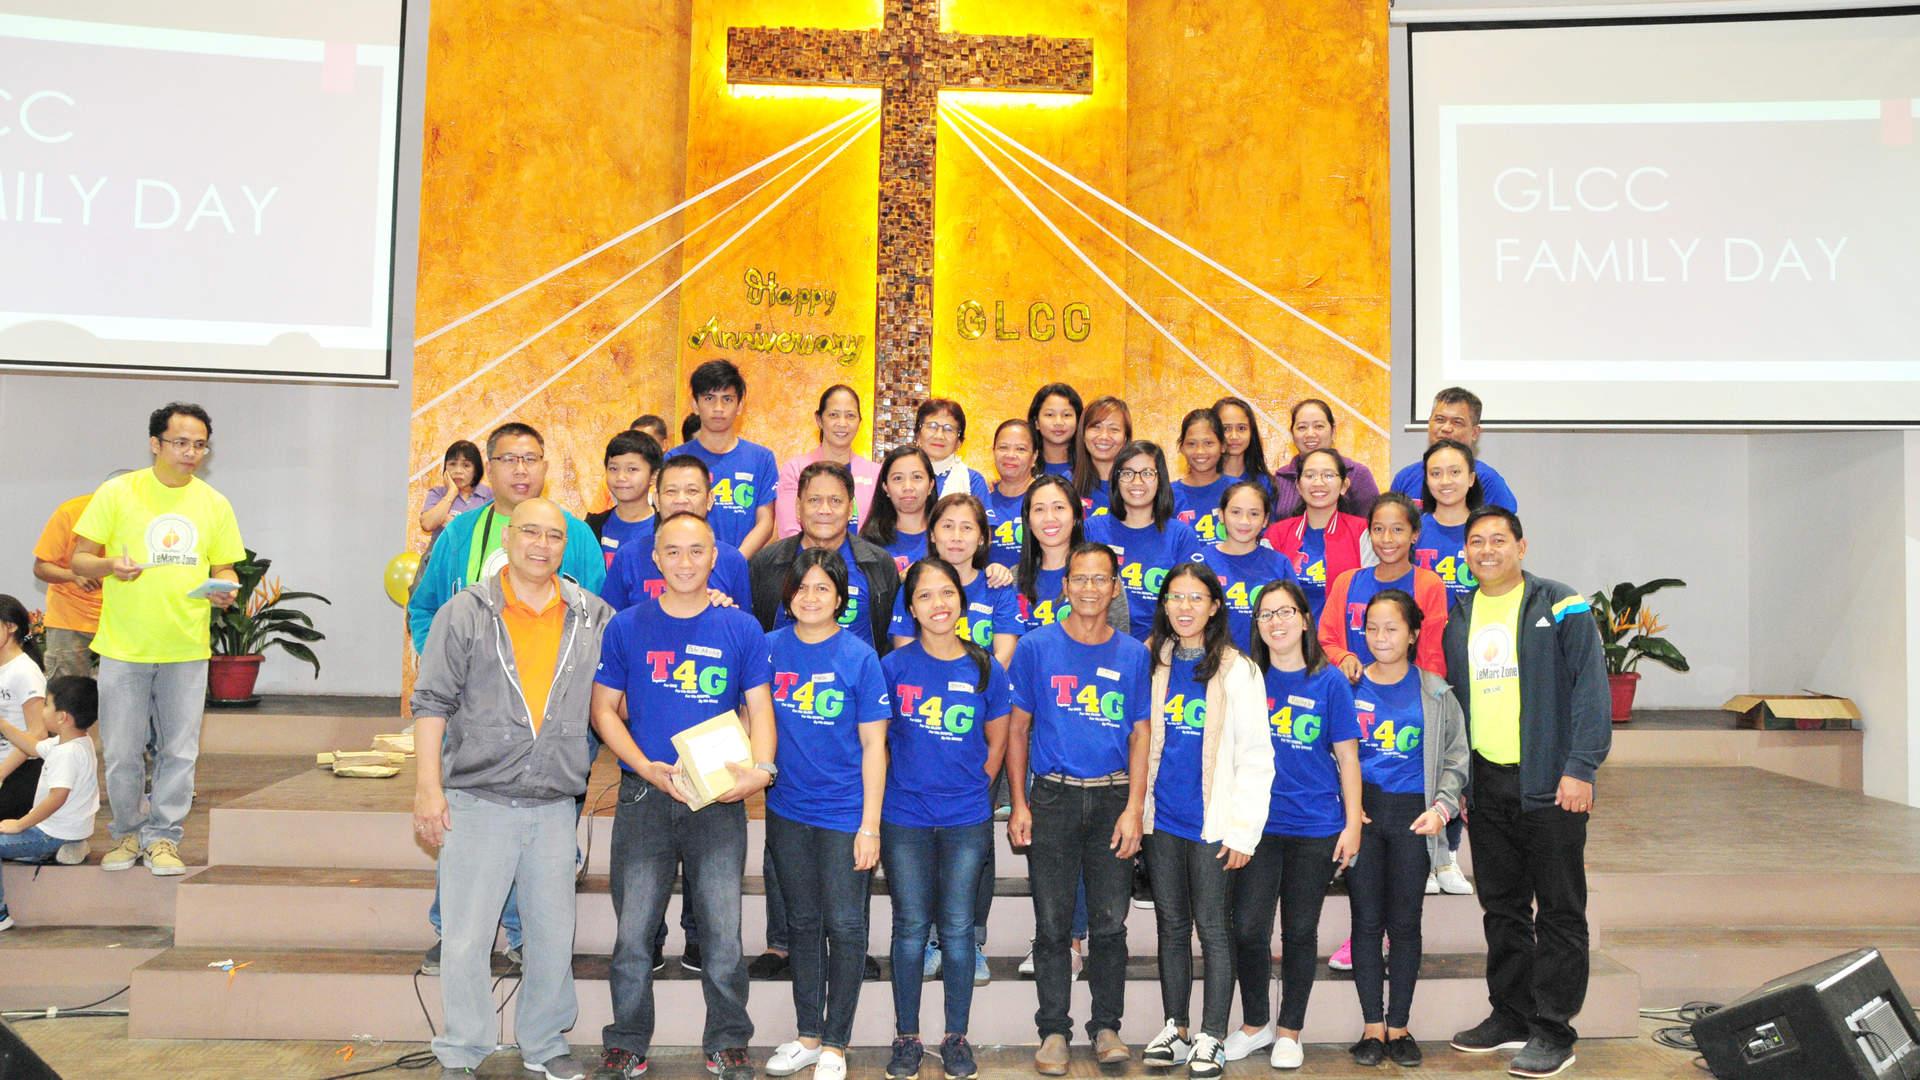 GLCC Family Day 2018 (11)